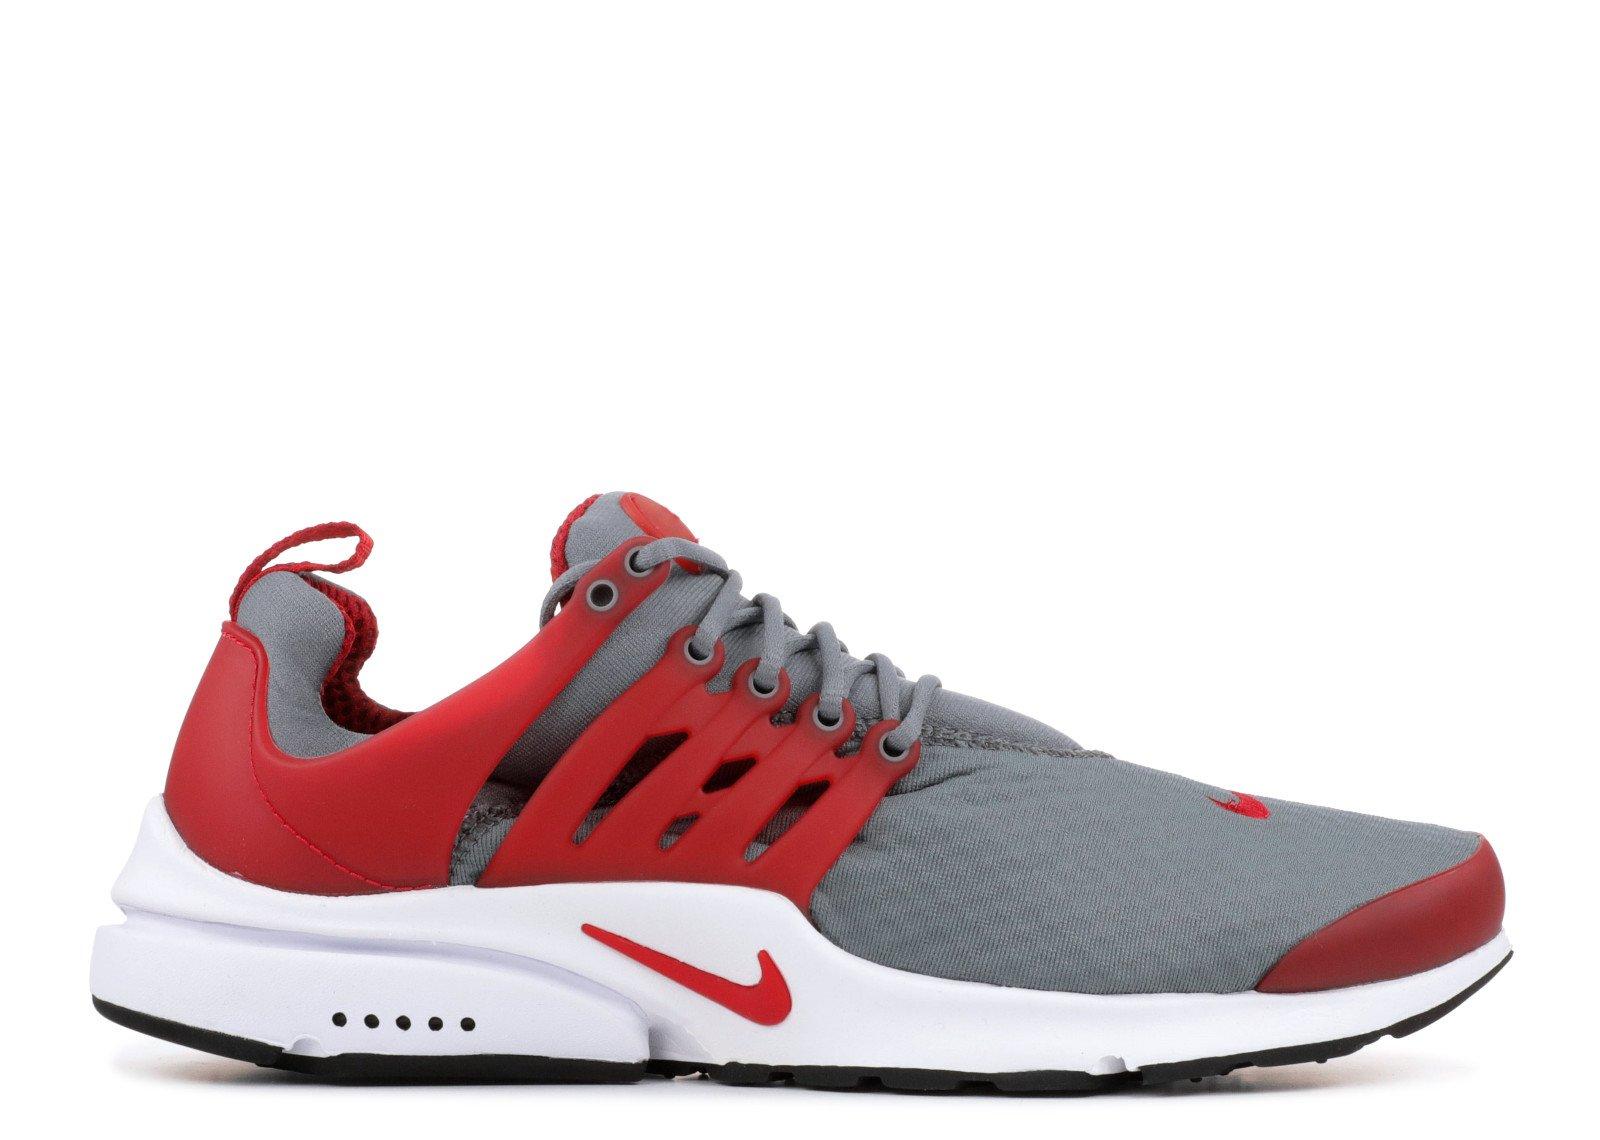 separation shoes 3c332 3e75c Galleon - Men s Nike Air Presto Essential Shoe